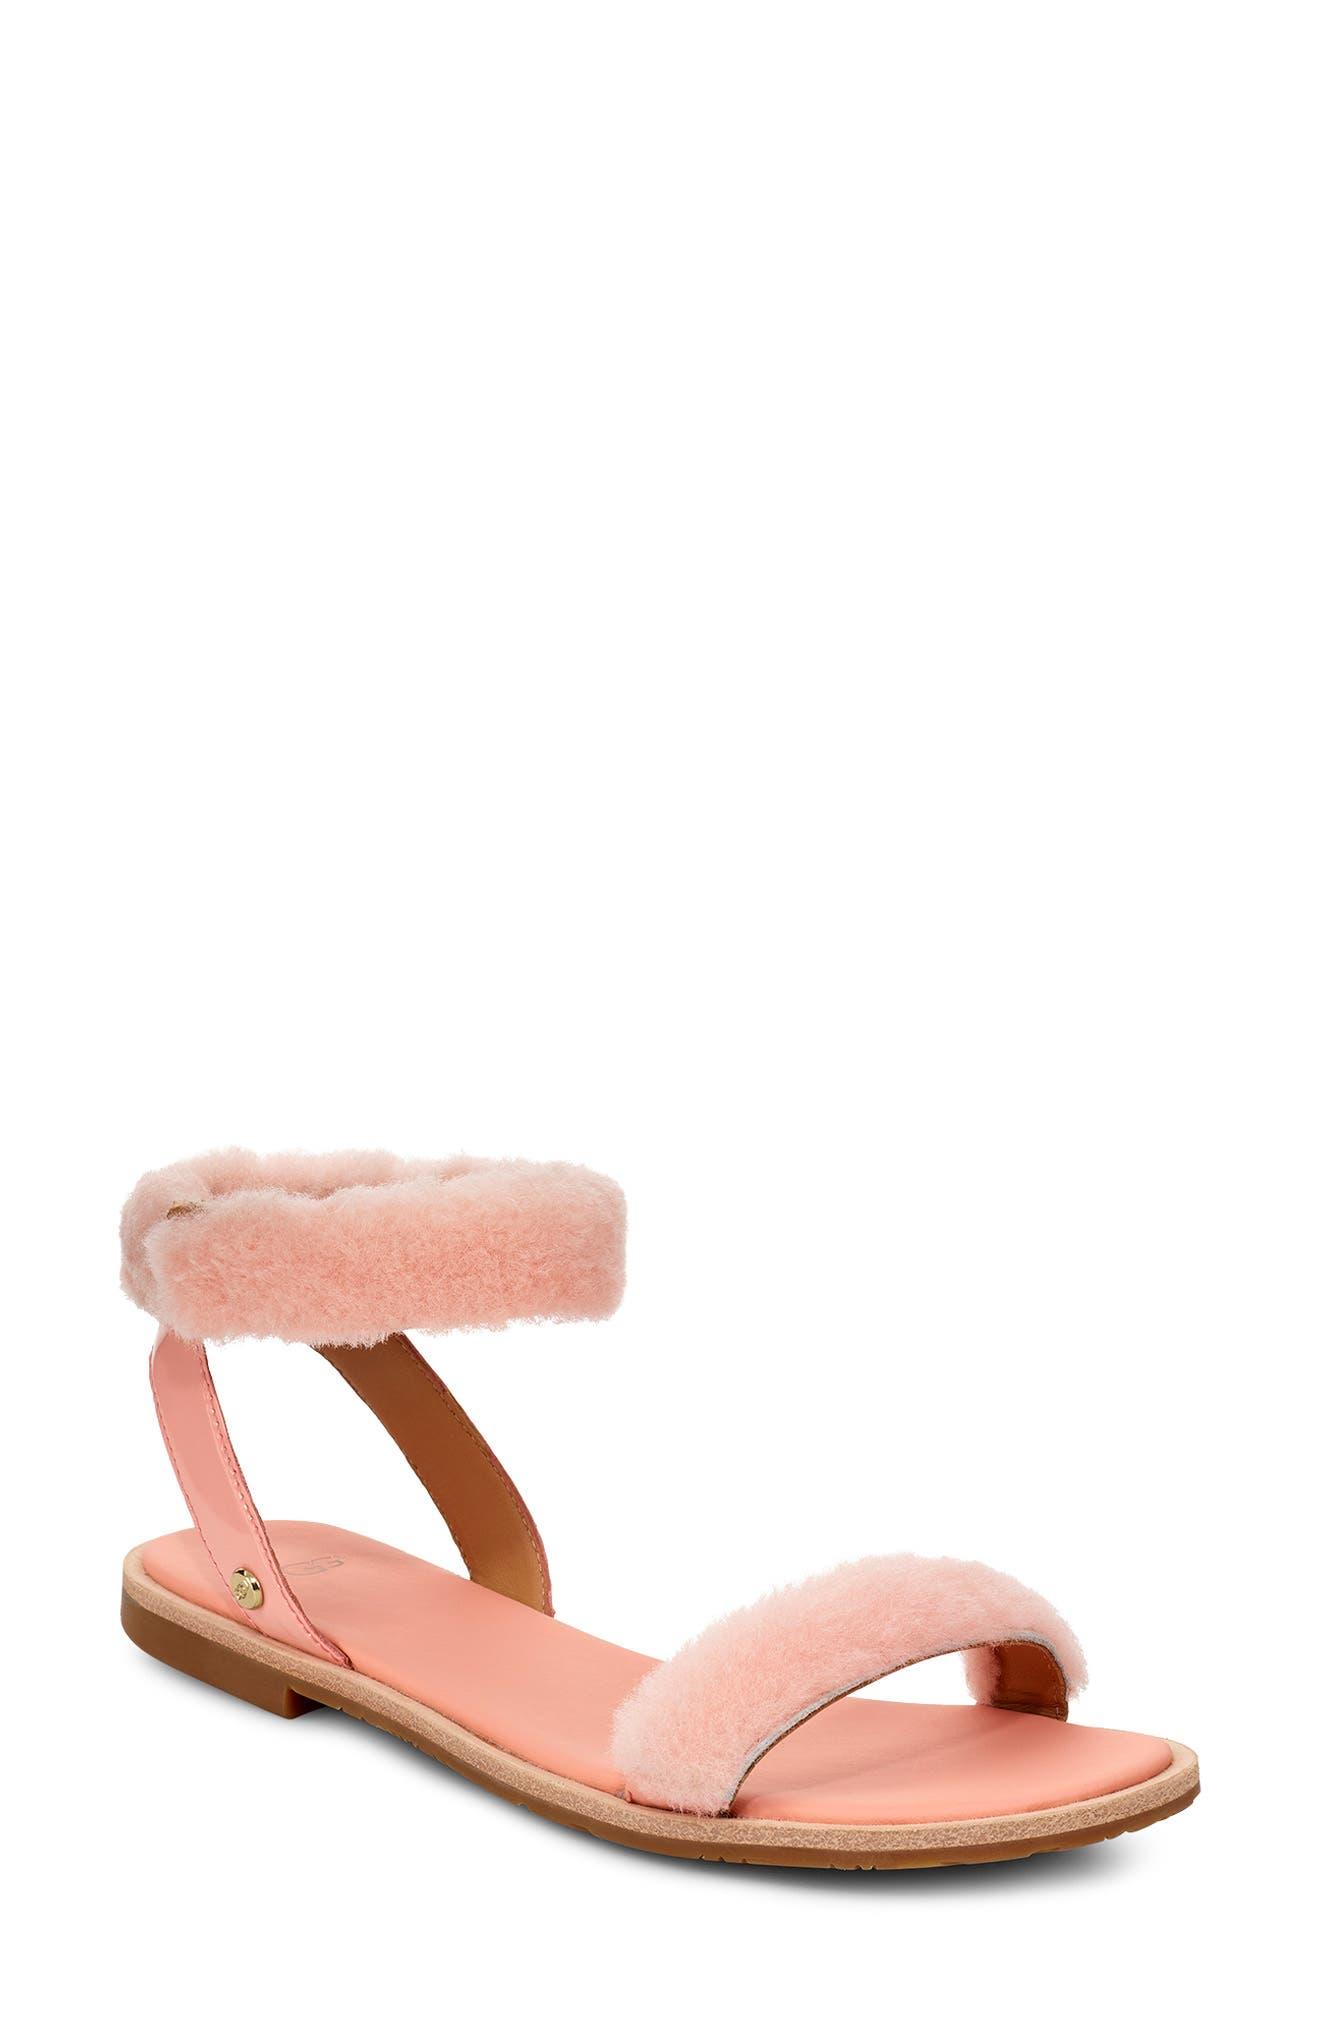 ebfc551cd405 Ugg Fluff Springs Genuine Shearling Sandal- Pink